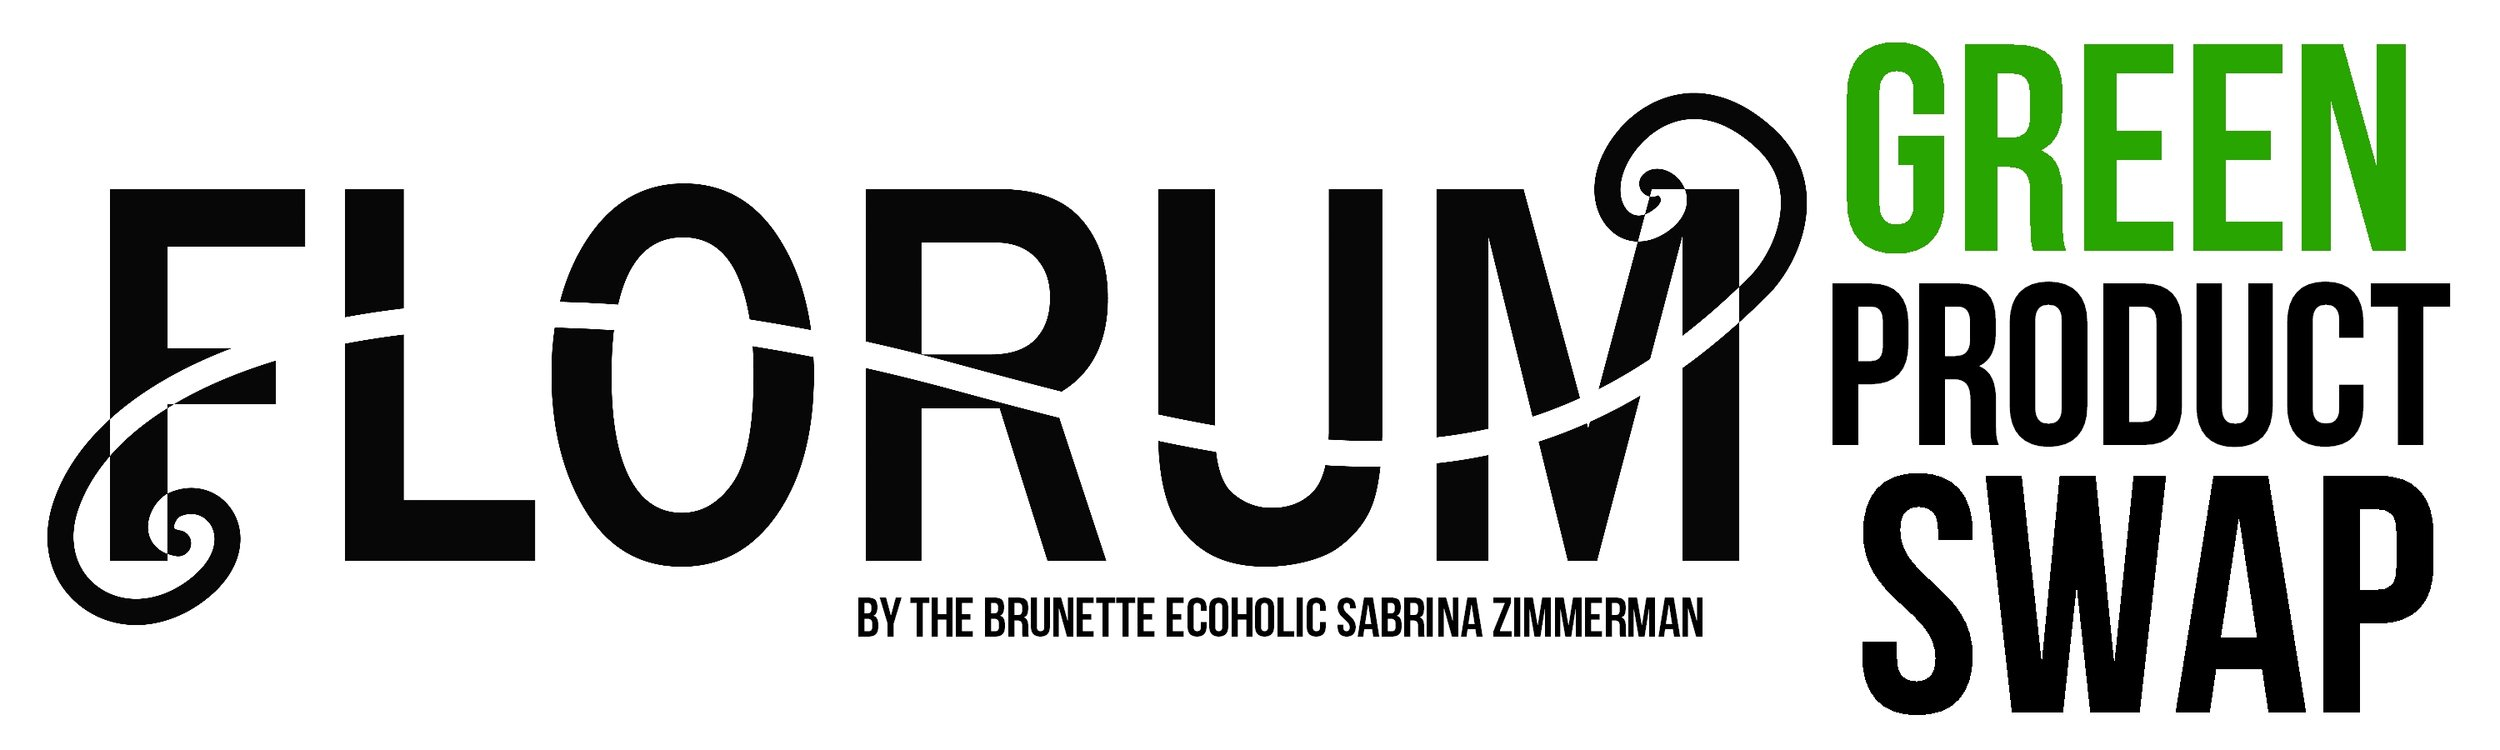 Florum Fashion Magazine - Green Product Swap - by Sabrina Zimmerman of Brunette Ecoholic - Innersense Beauty - Piper Wai - Kari Gran - Coola Suncare - Fleur Organics -Lurk Fragrance - Auve -Sircuit